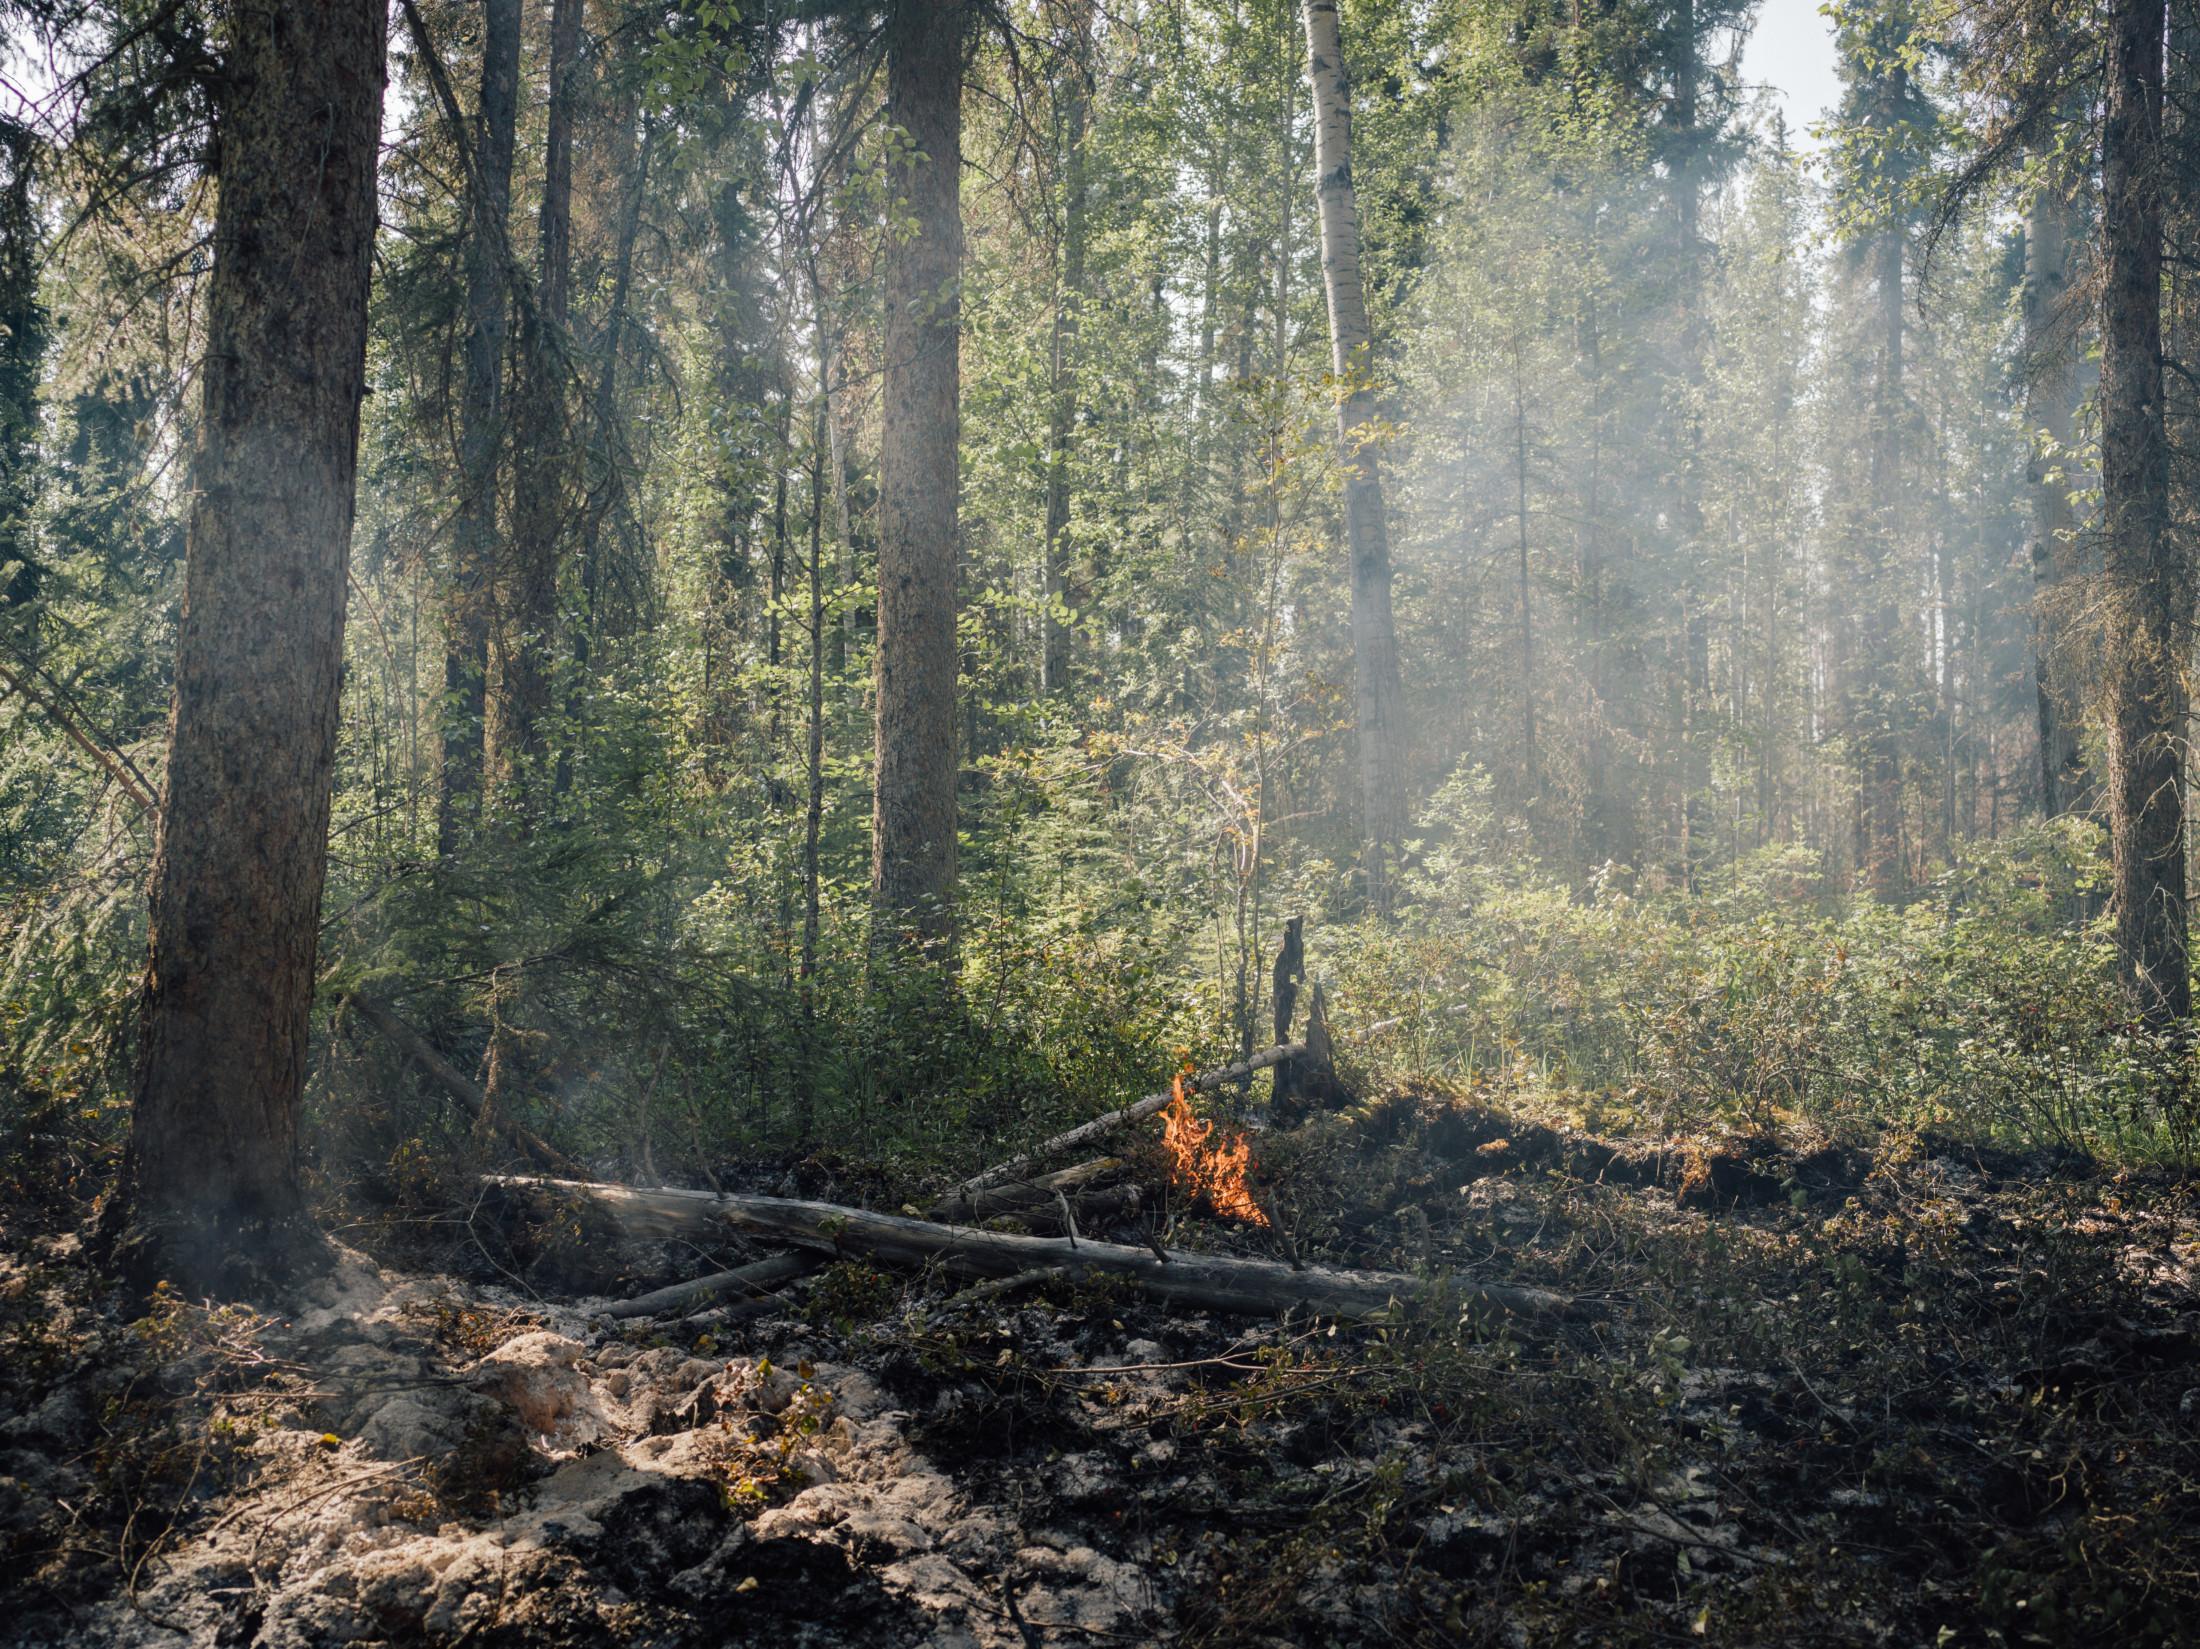 Fire along the Kechika River Kaska Guardians Taylor Roades